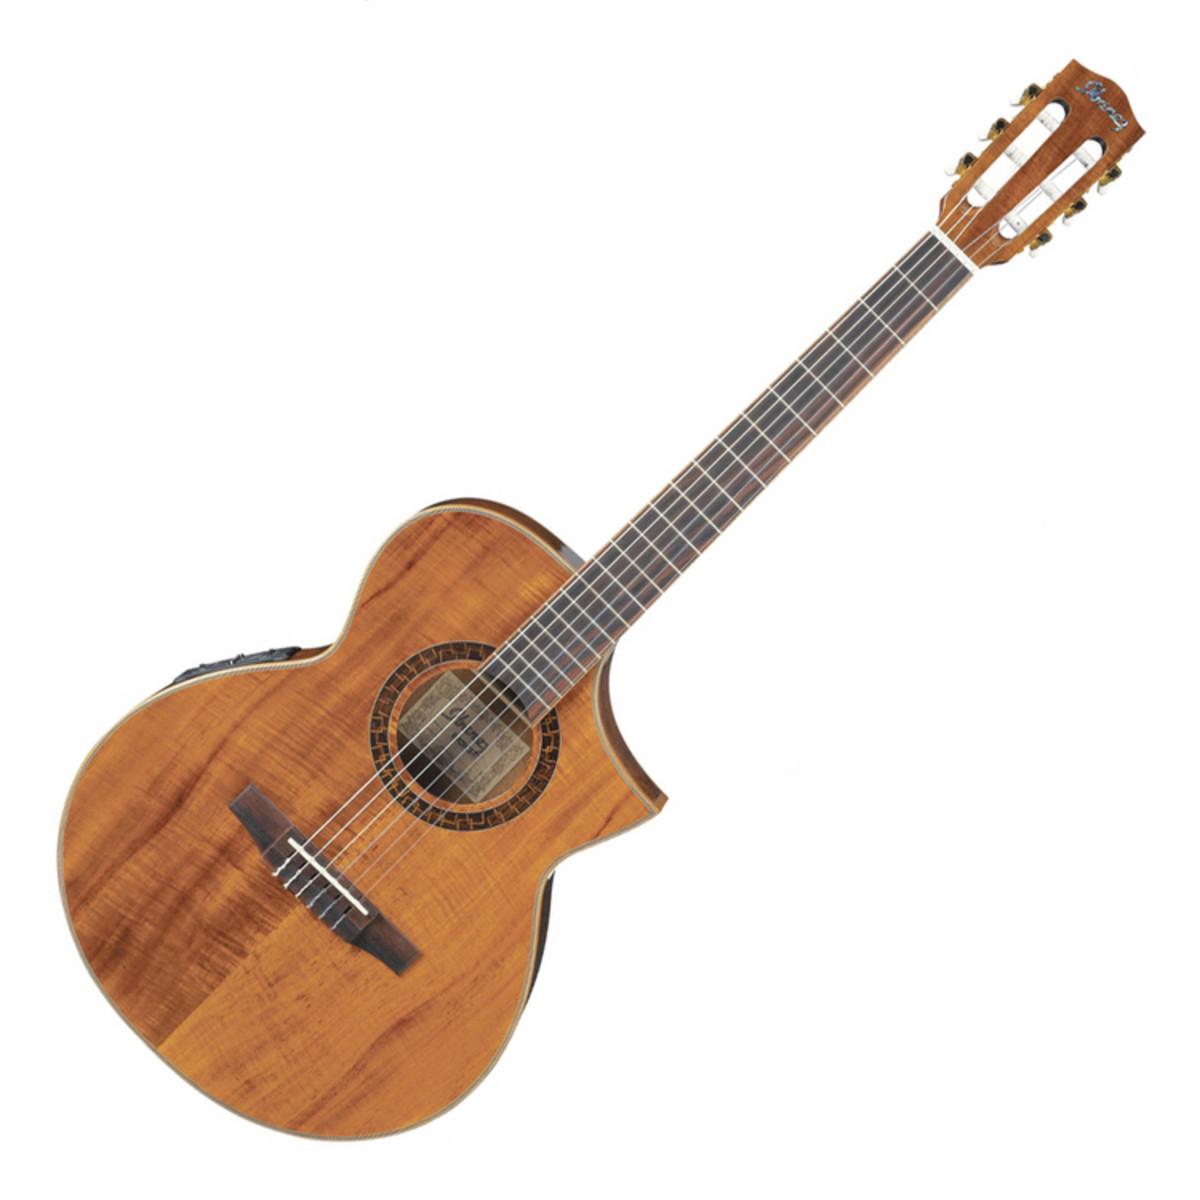 ibanez ewn28koe exotic wood electro acoustic guitar natural at gear4music. Black Bedroom Furniture Sets. Home Design Ideas